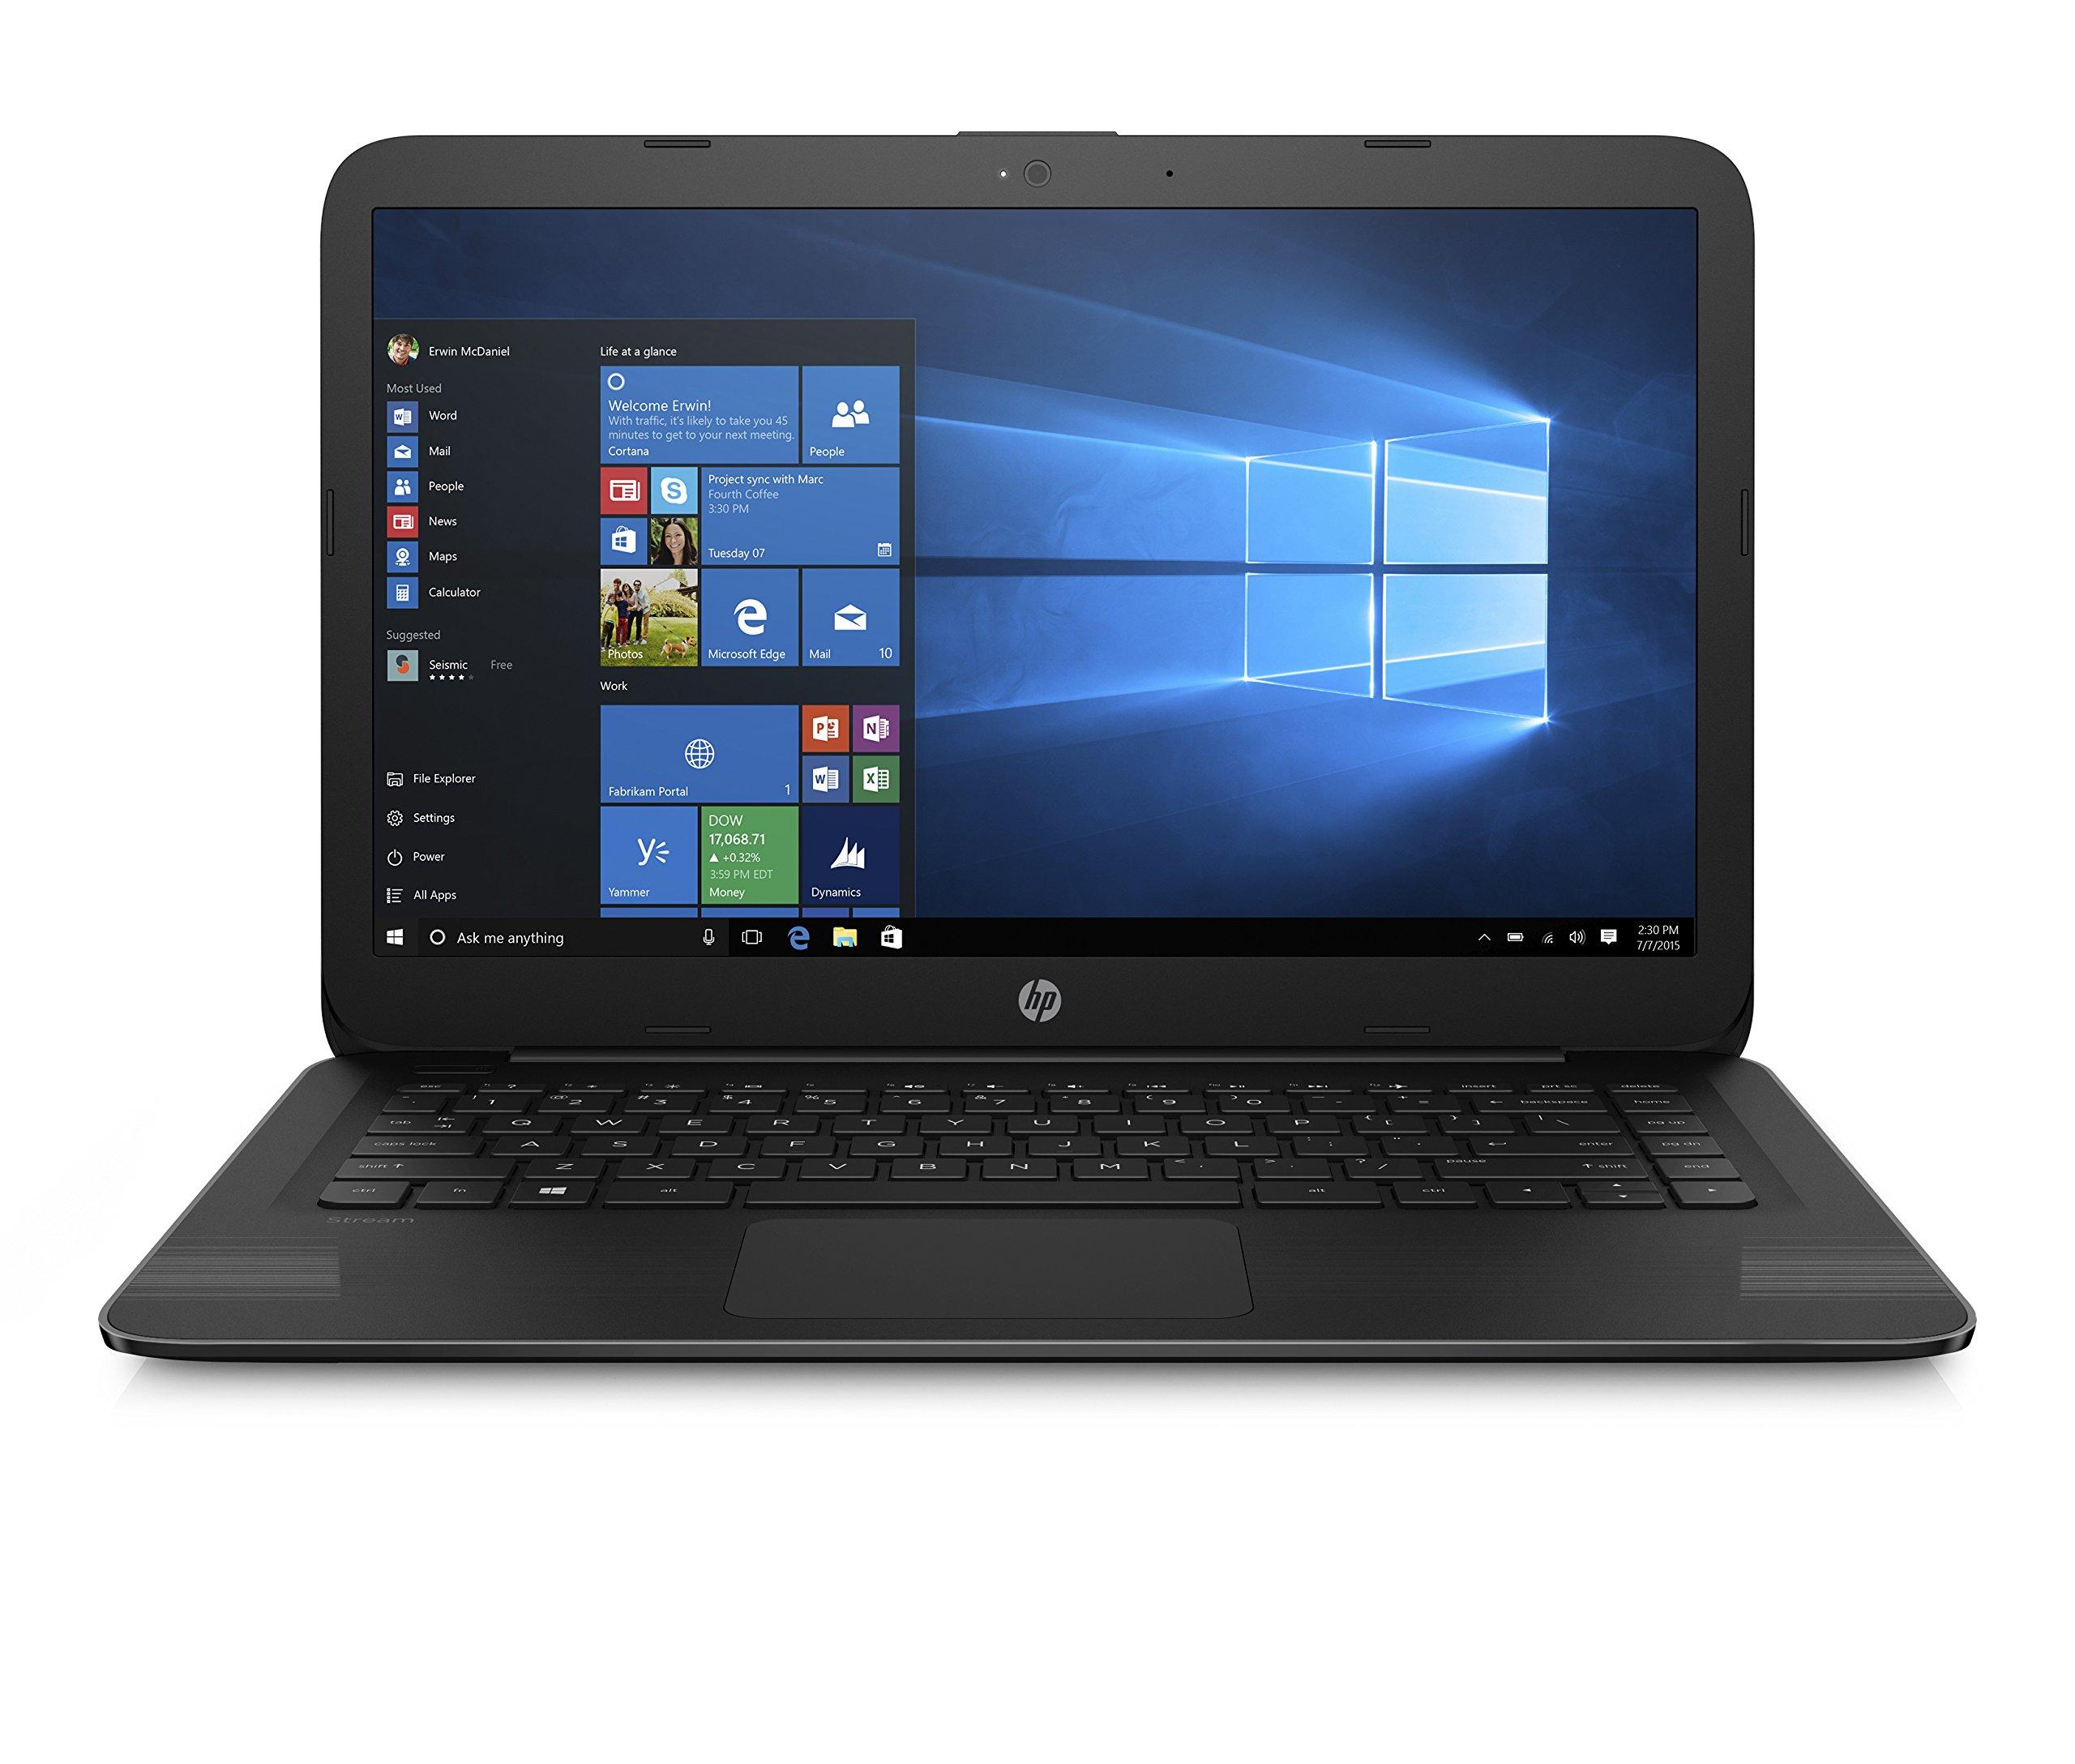 HP 14 Inch Stream Laptop, Intel Celeron N3060 Processor, 4GB RAM, 32GB eMMC, 1-year Office 365 Personal included, HDMI by HP